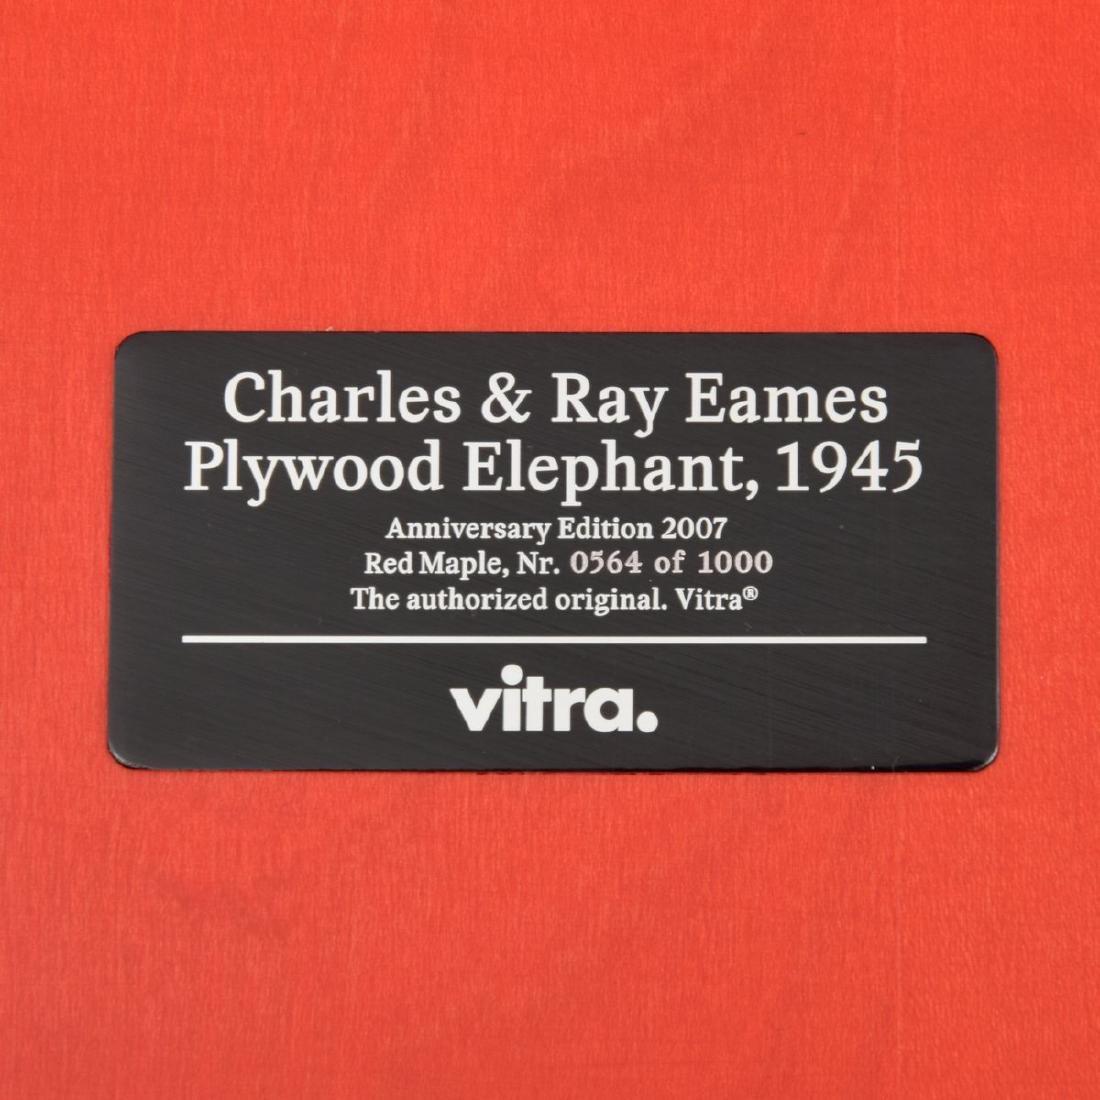 Charles & Ray Eames Elephant, Anniversary Edition - 5